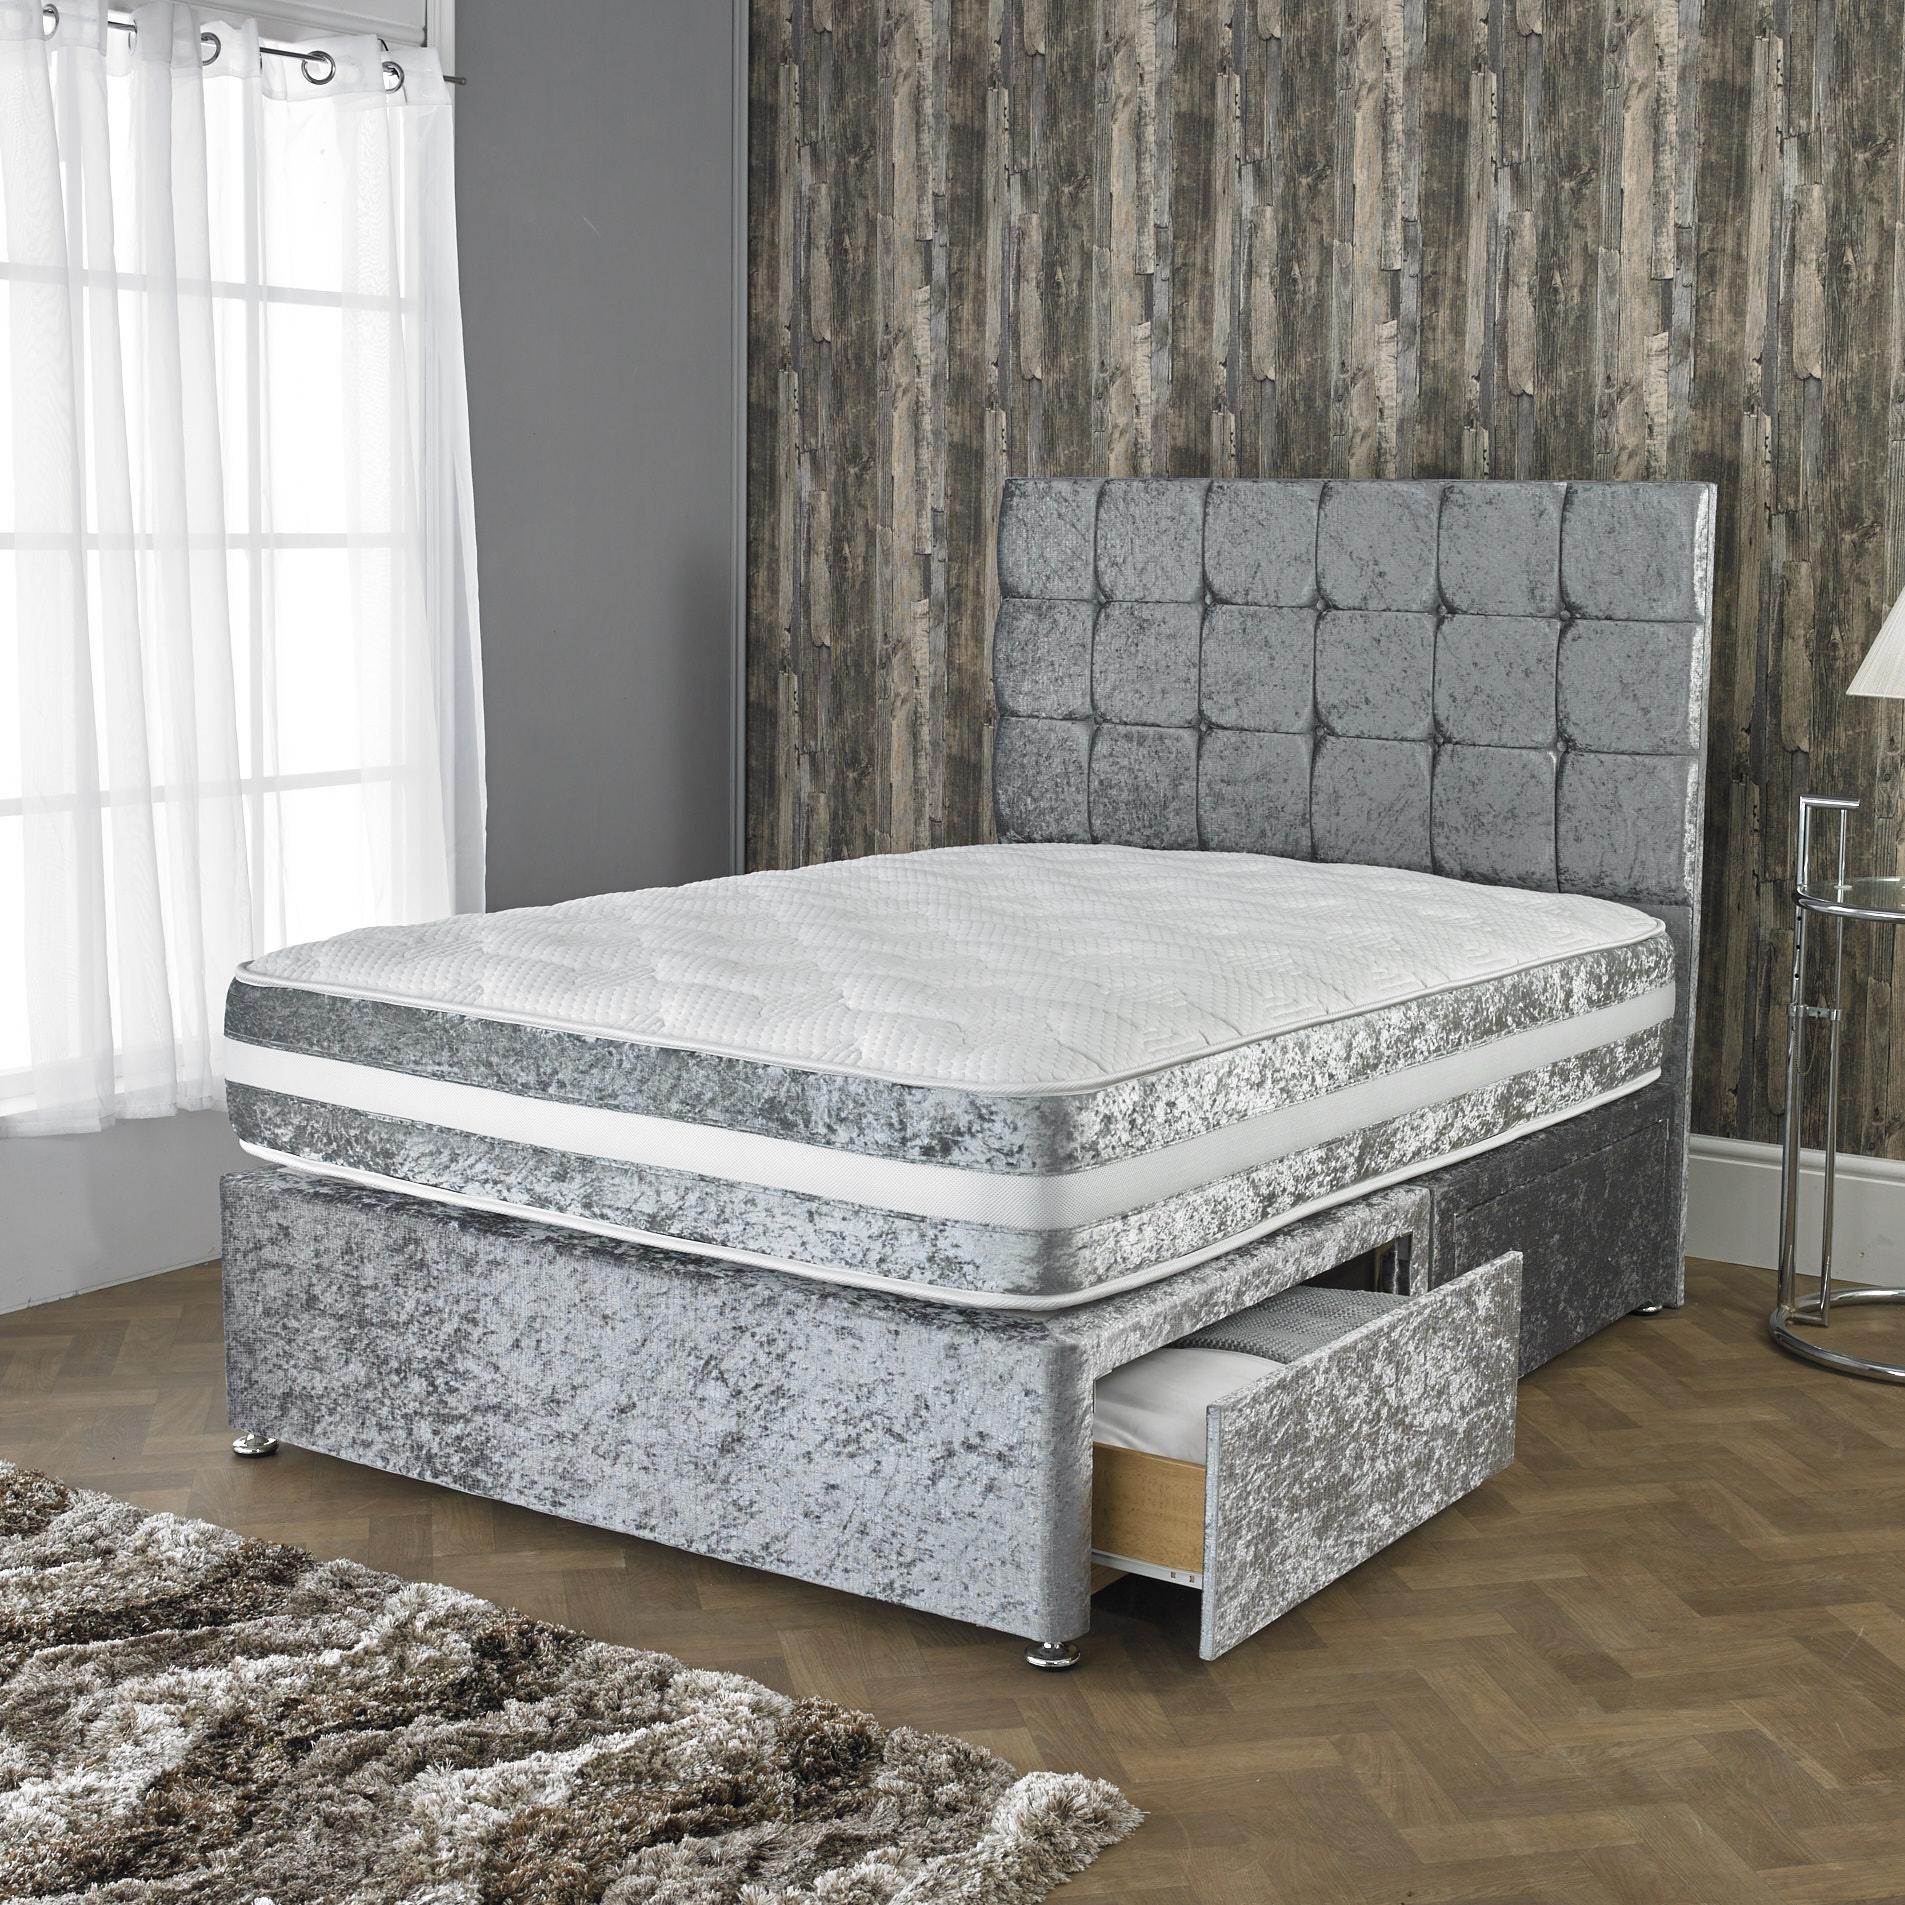 Crushed Velvet Divan Bed With Open Spring Memory Foam